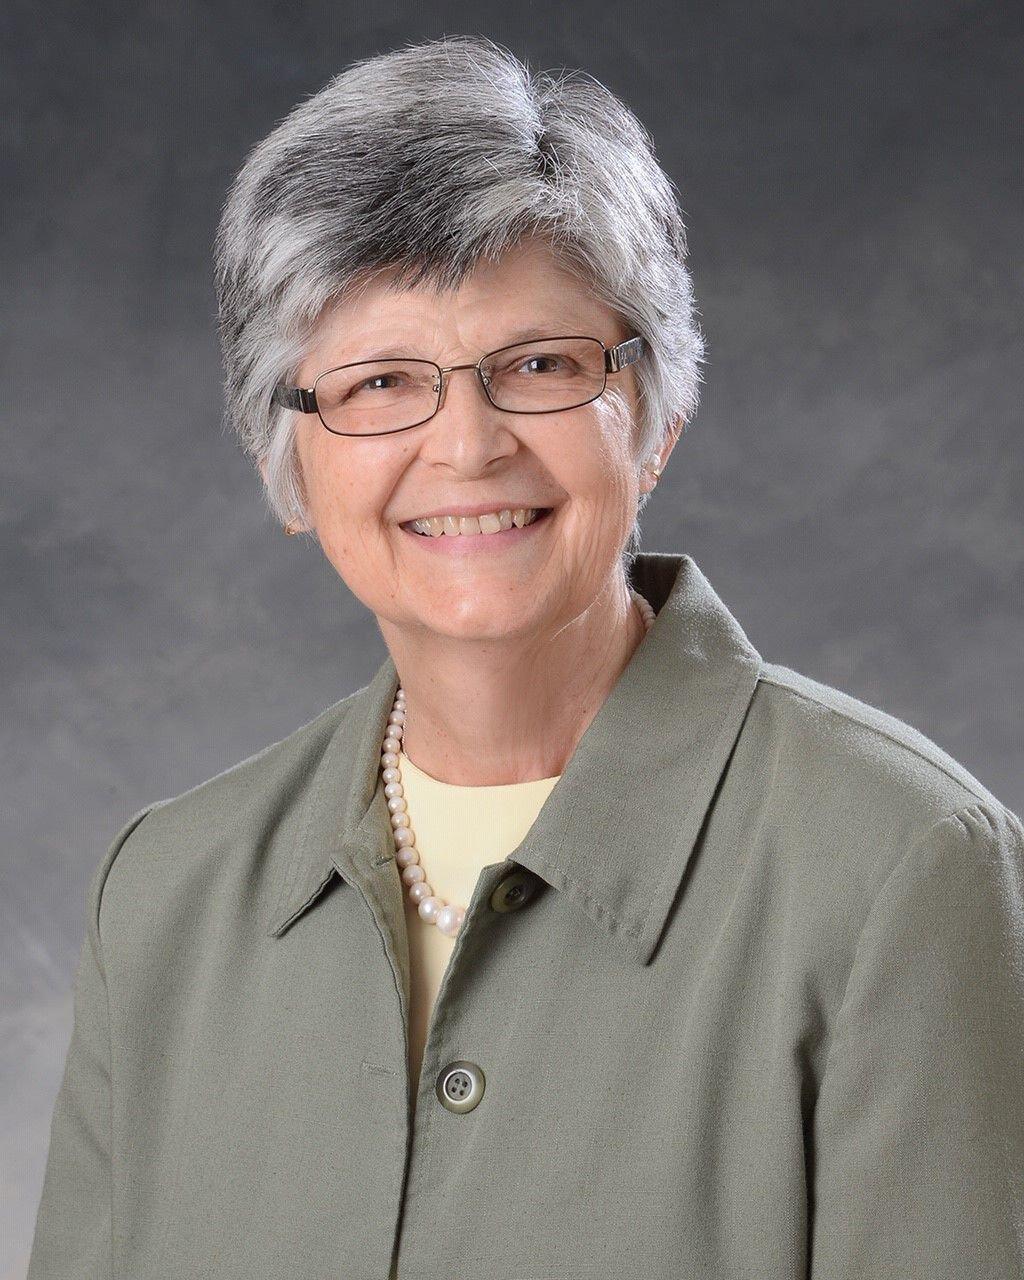 Deborah Damm-O'Brien